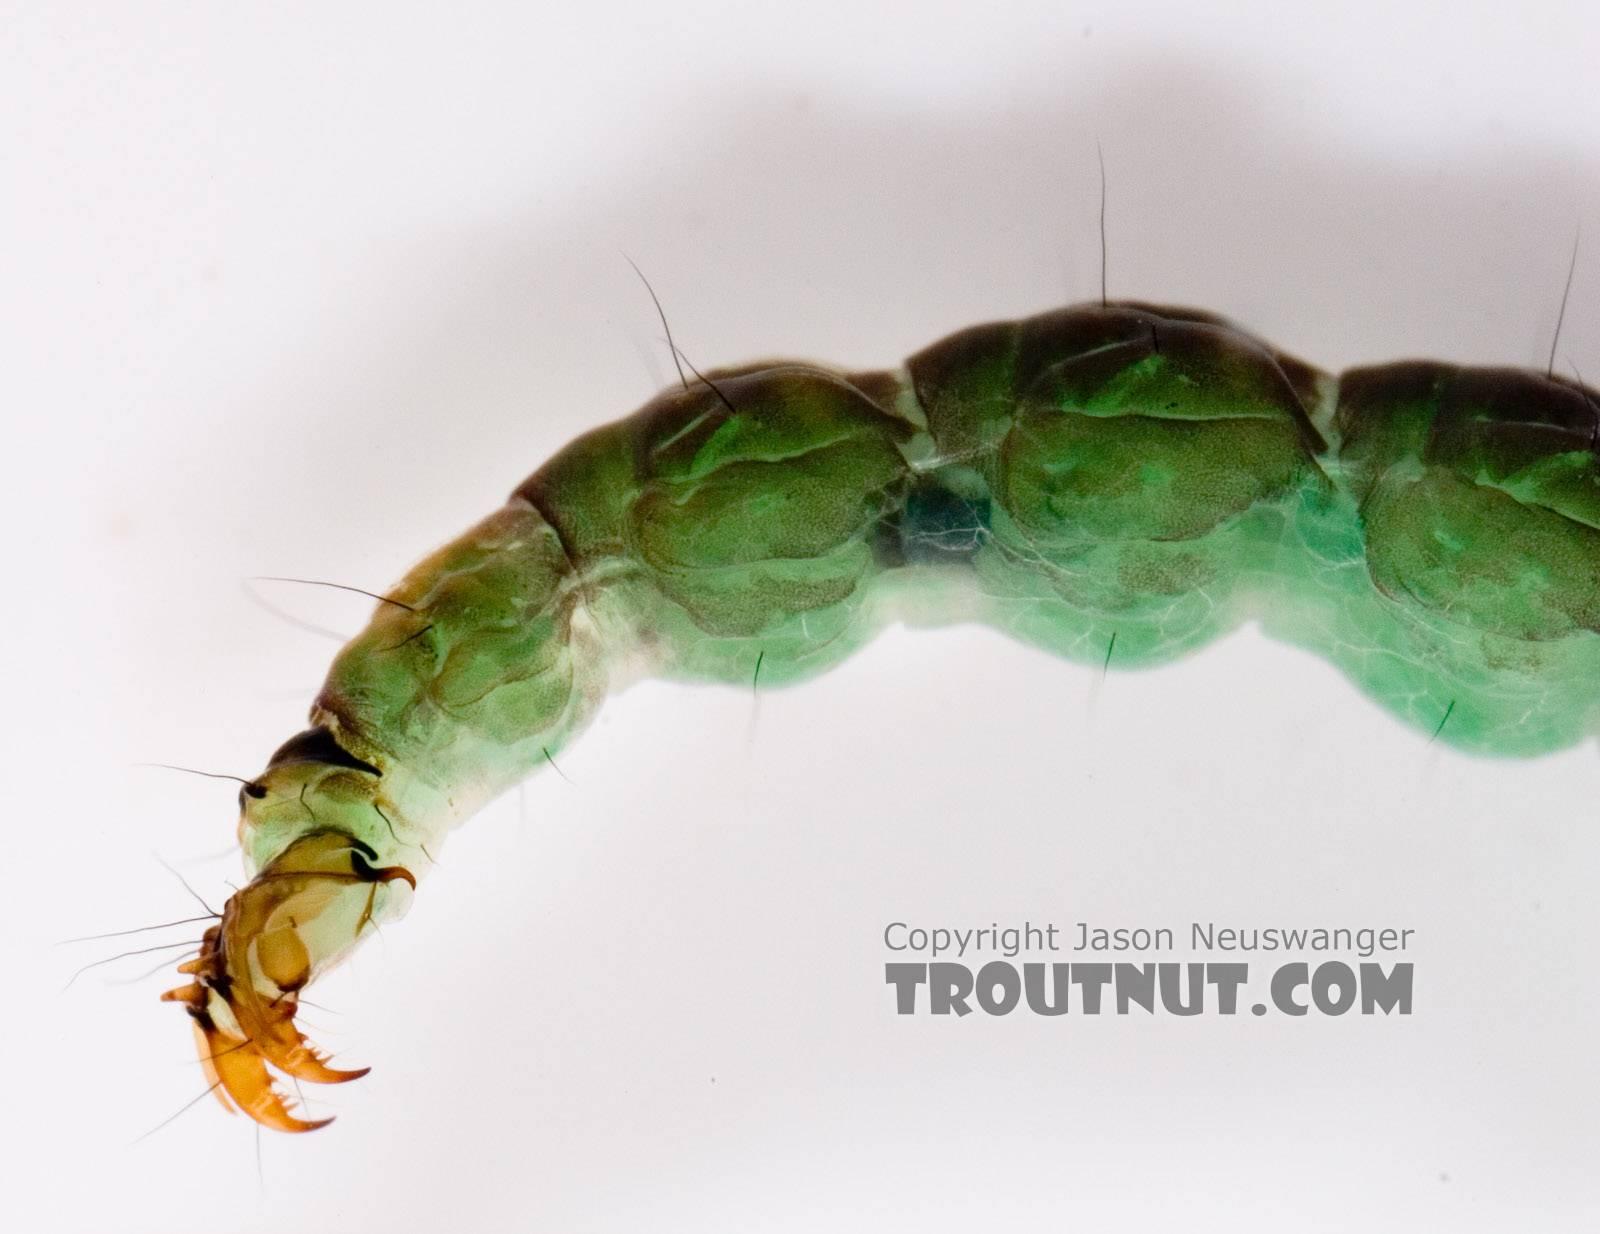 Rhyacophila fuscula (Green Sedge) Caddisfly Larva from Mystery Creek #62 in New York